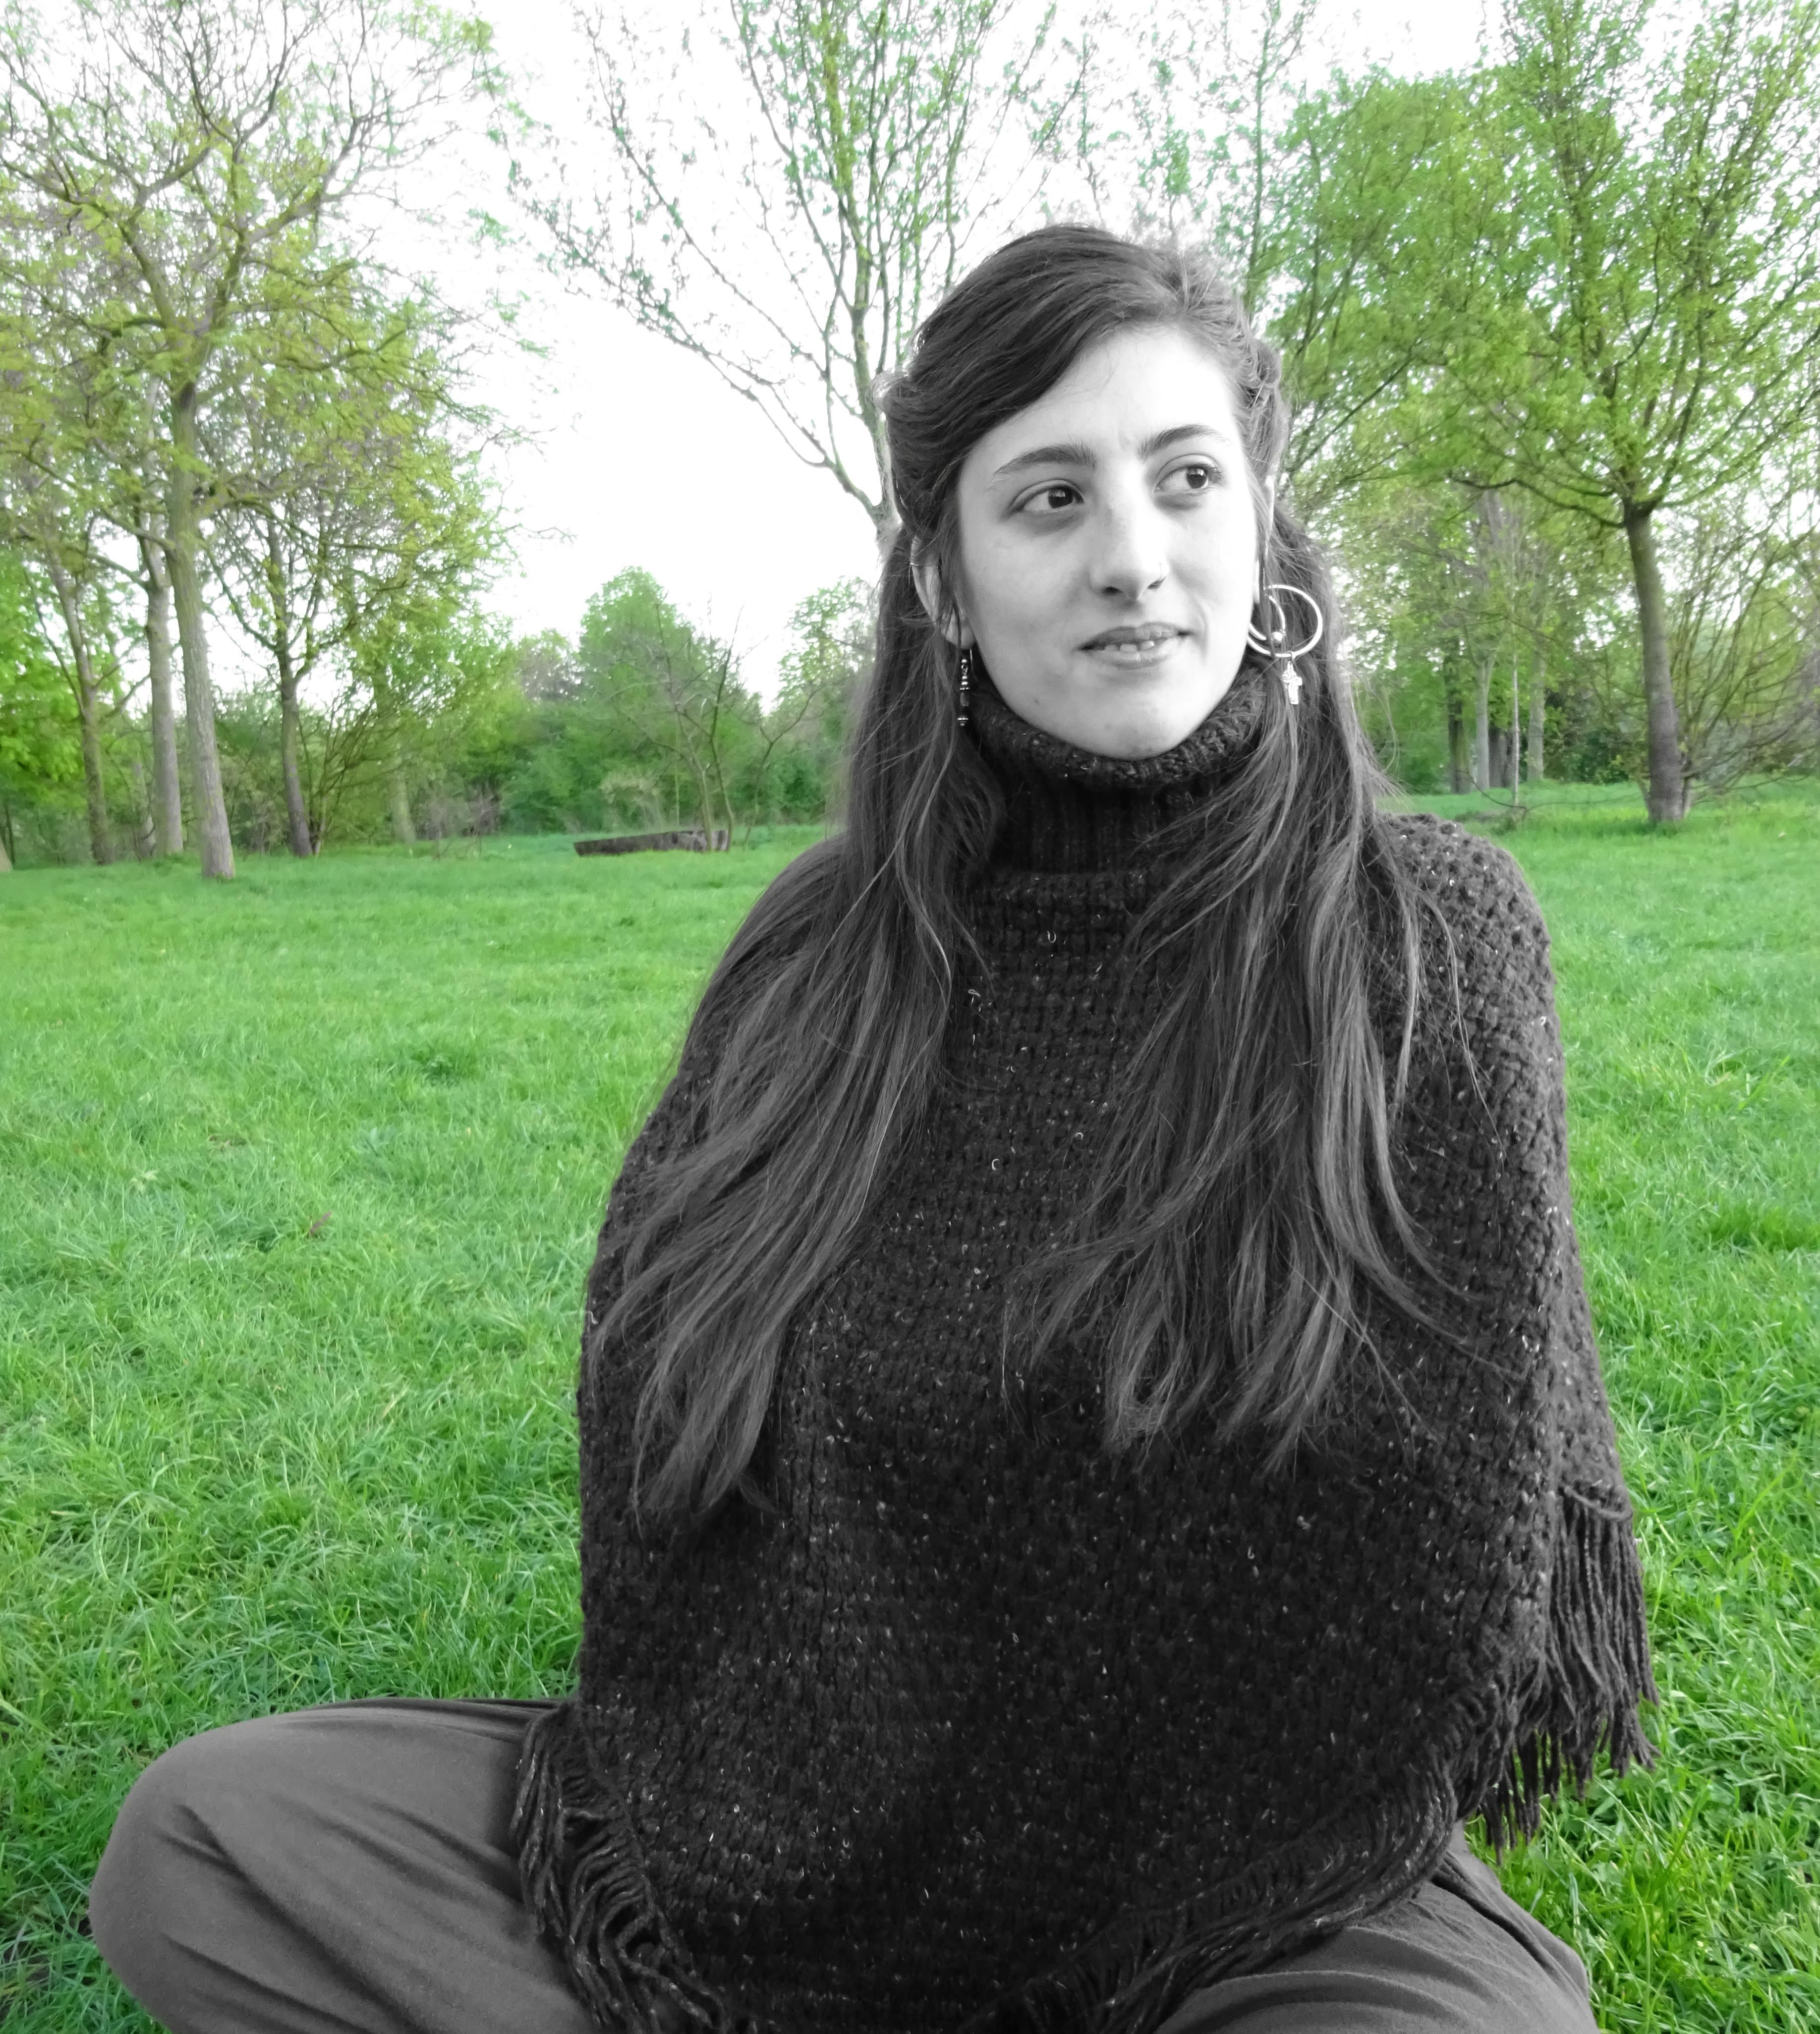 Louise Finot